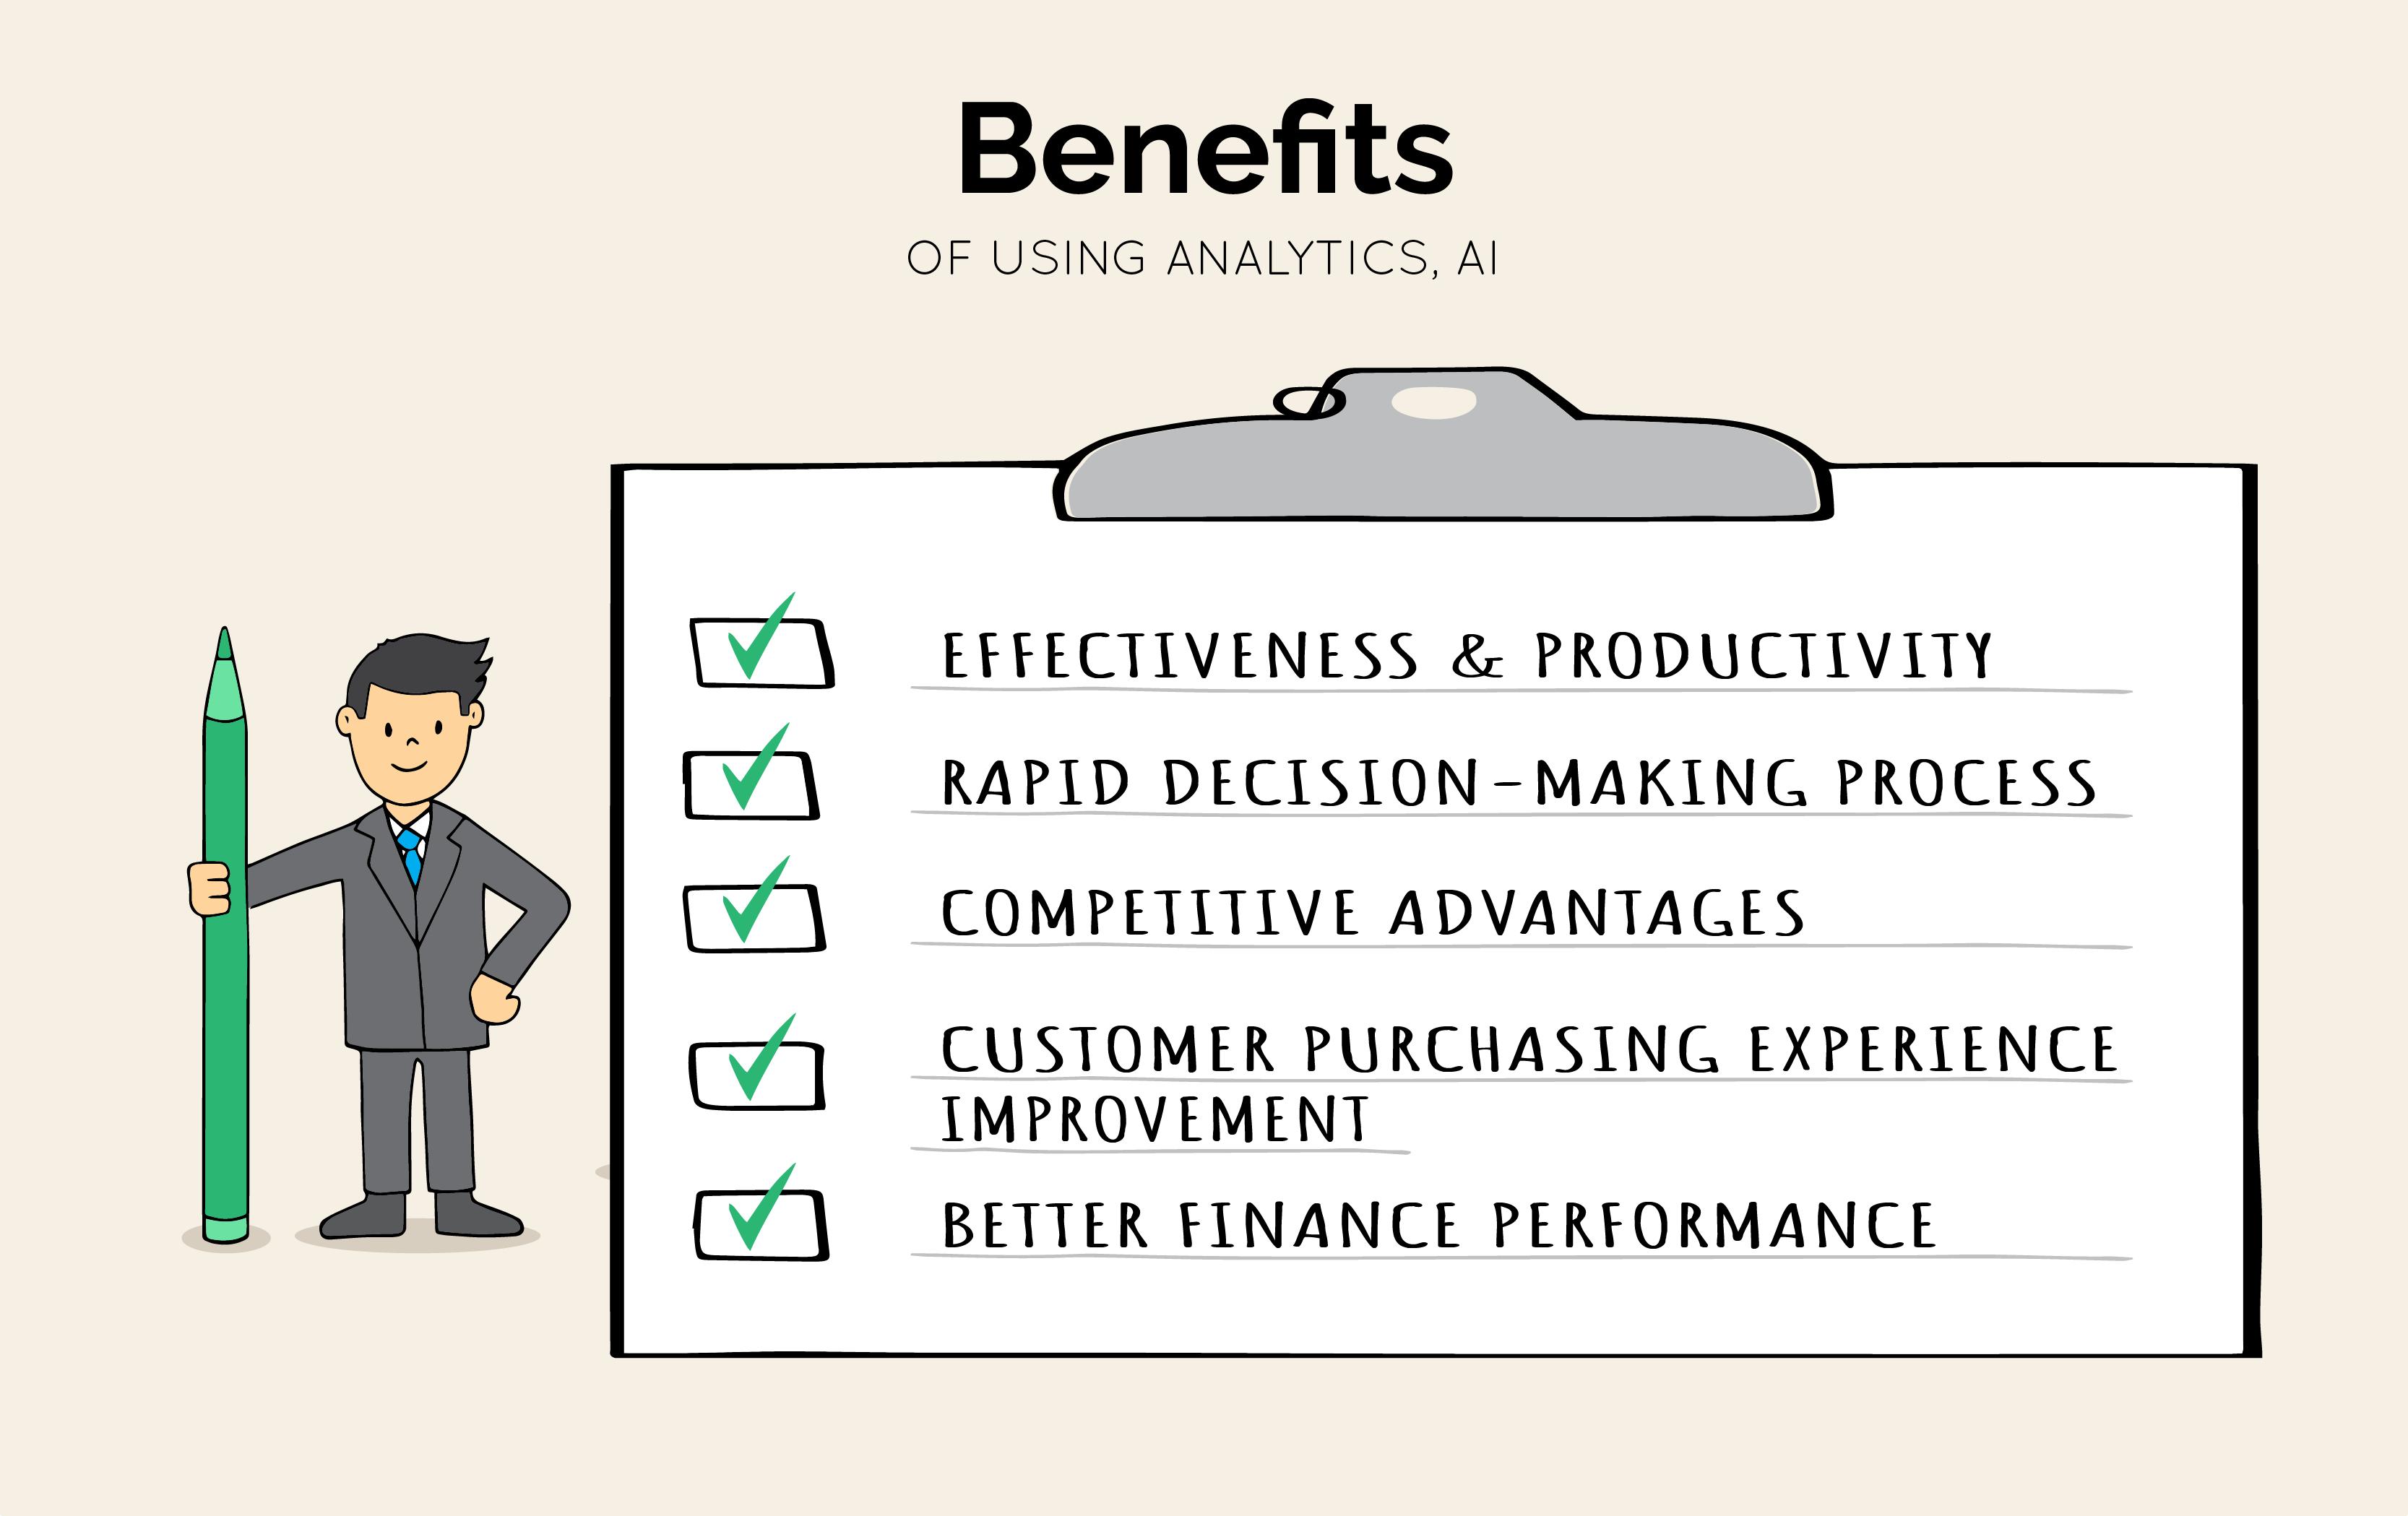 analytic-benefits-b2b-ecommerce-trends-2021